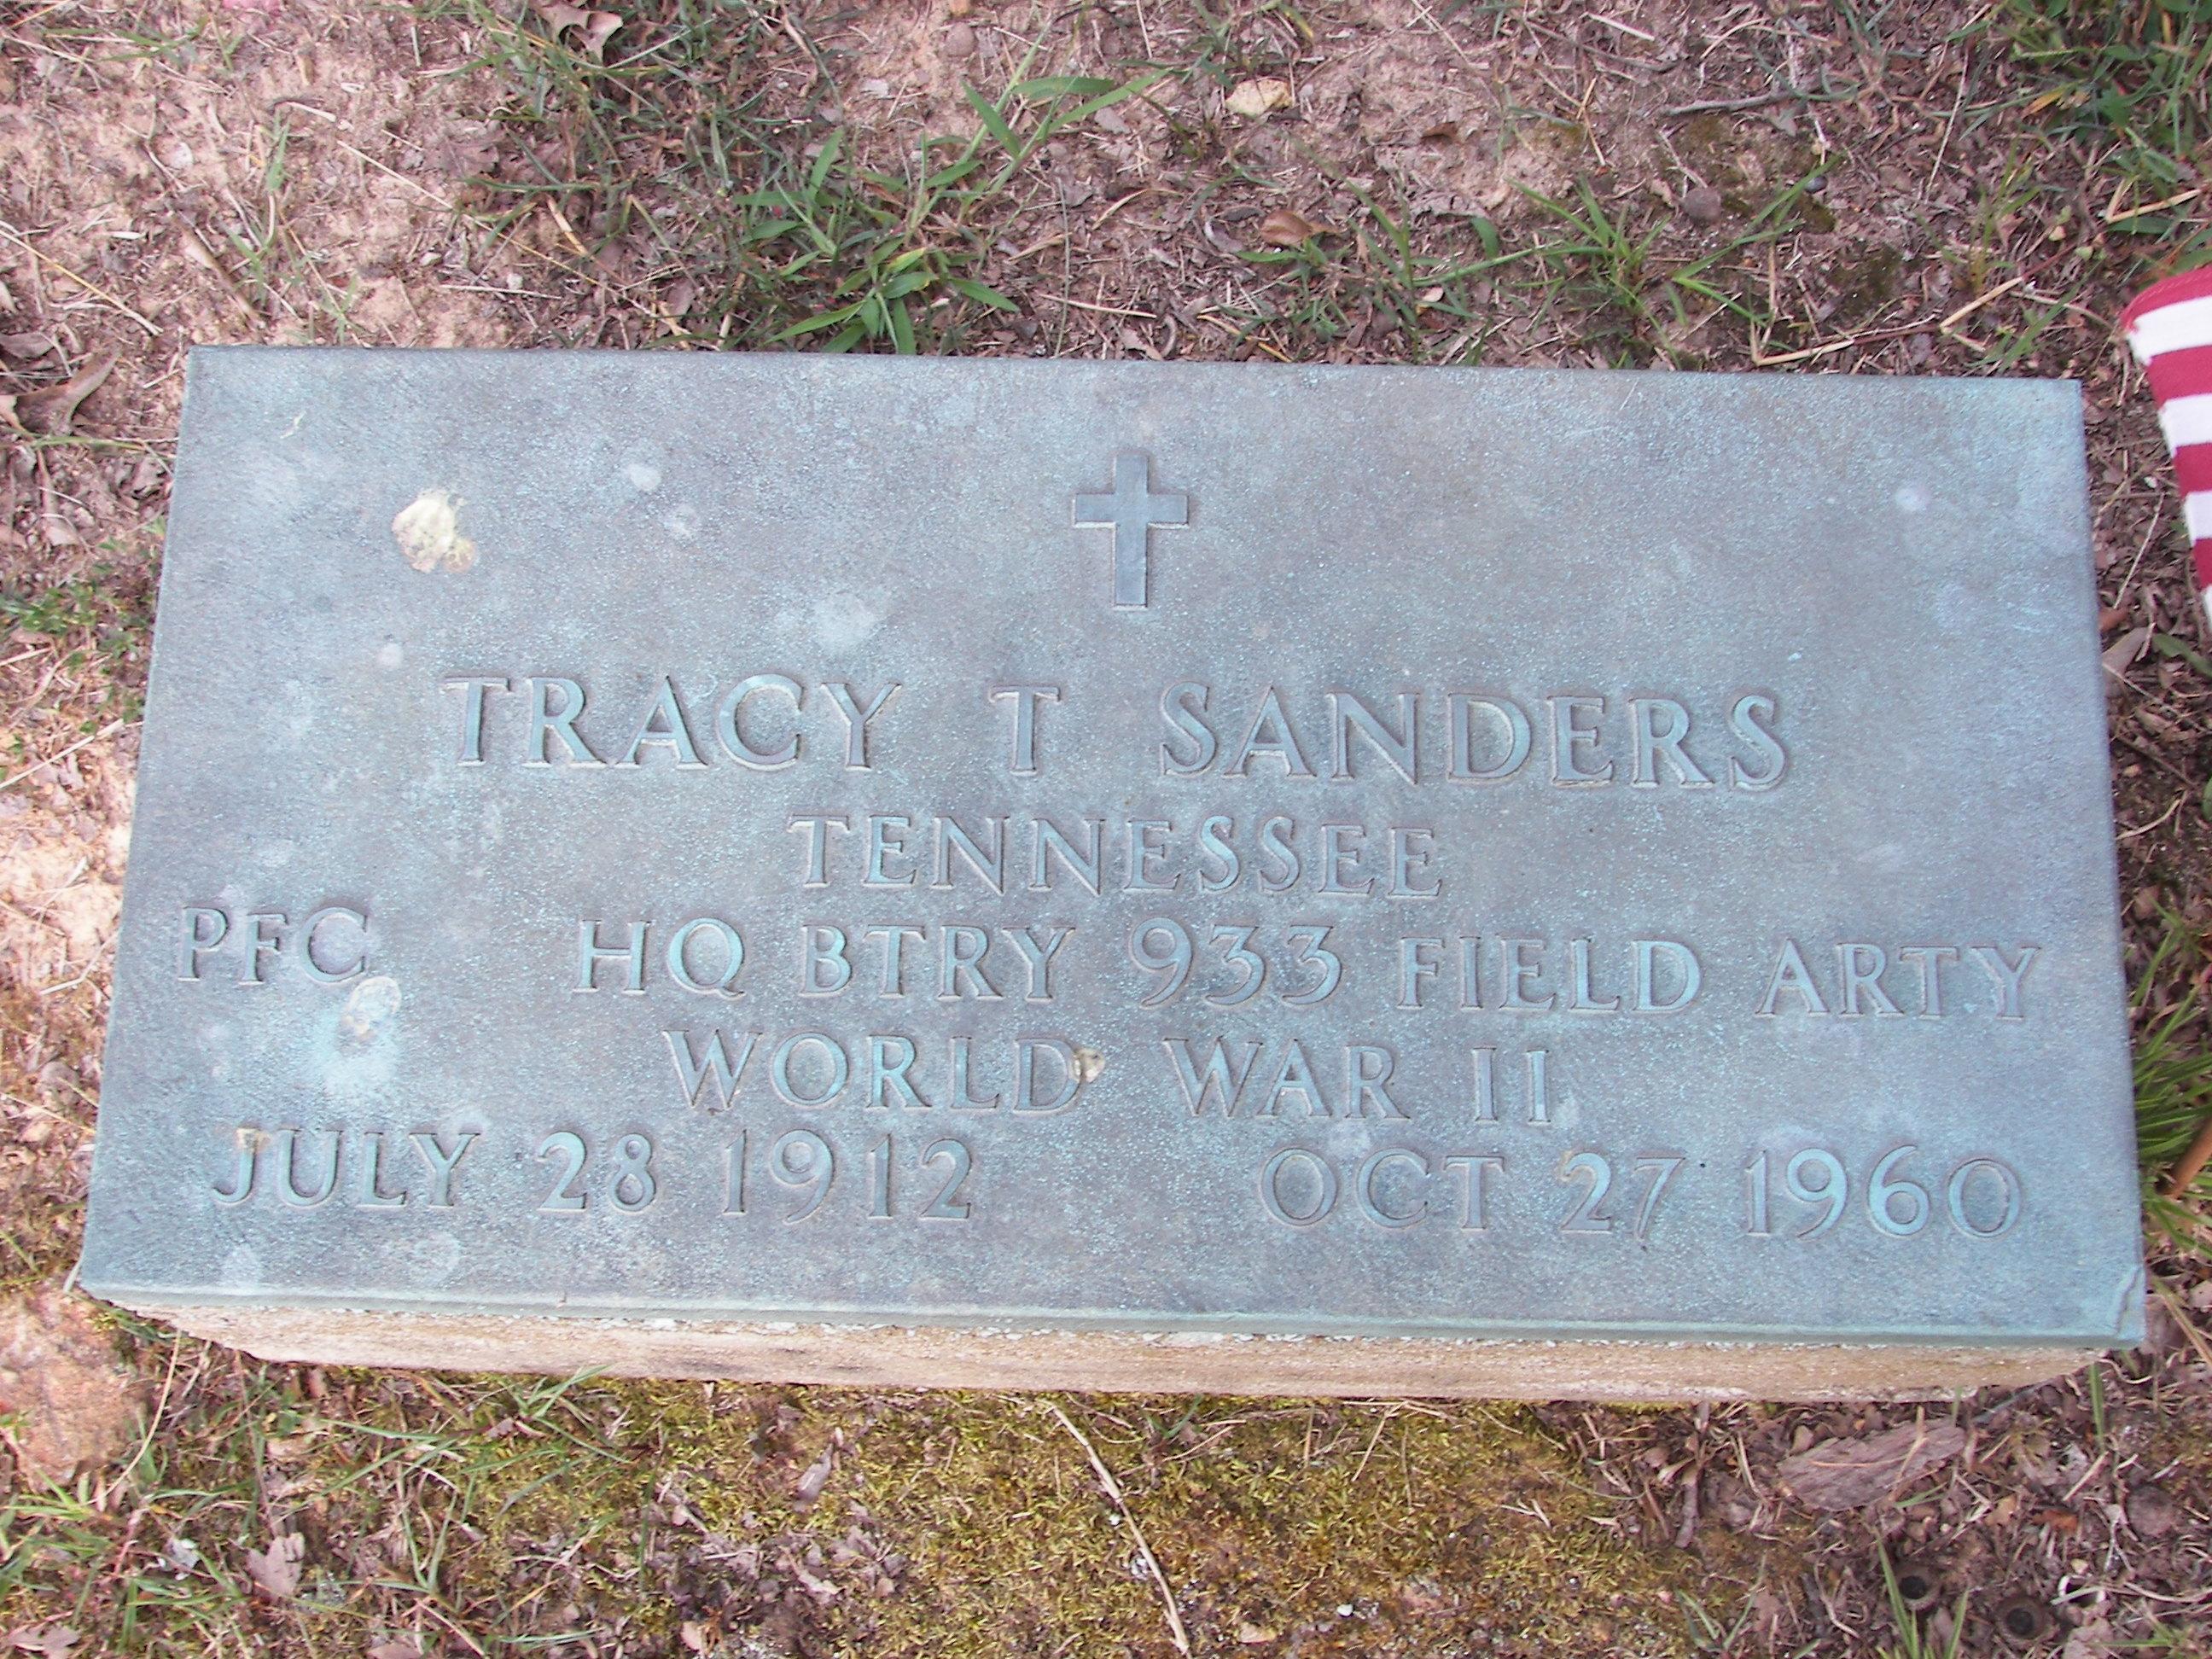 Thomas W Sanders